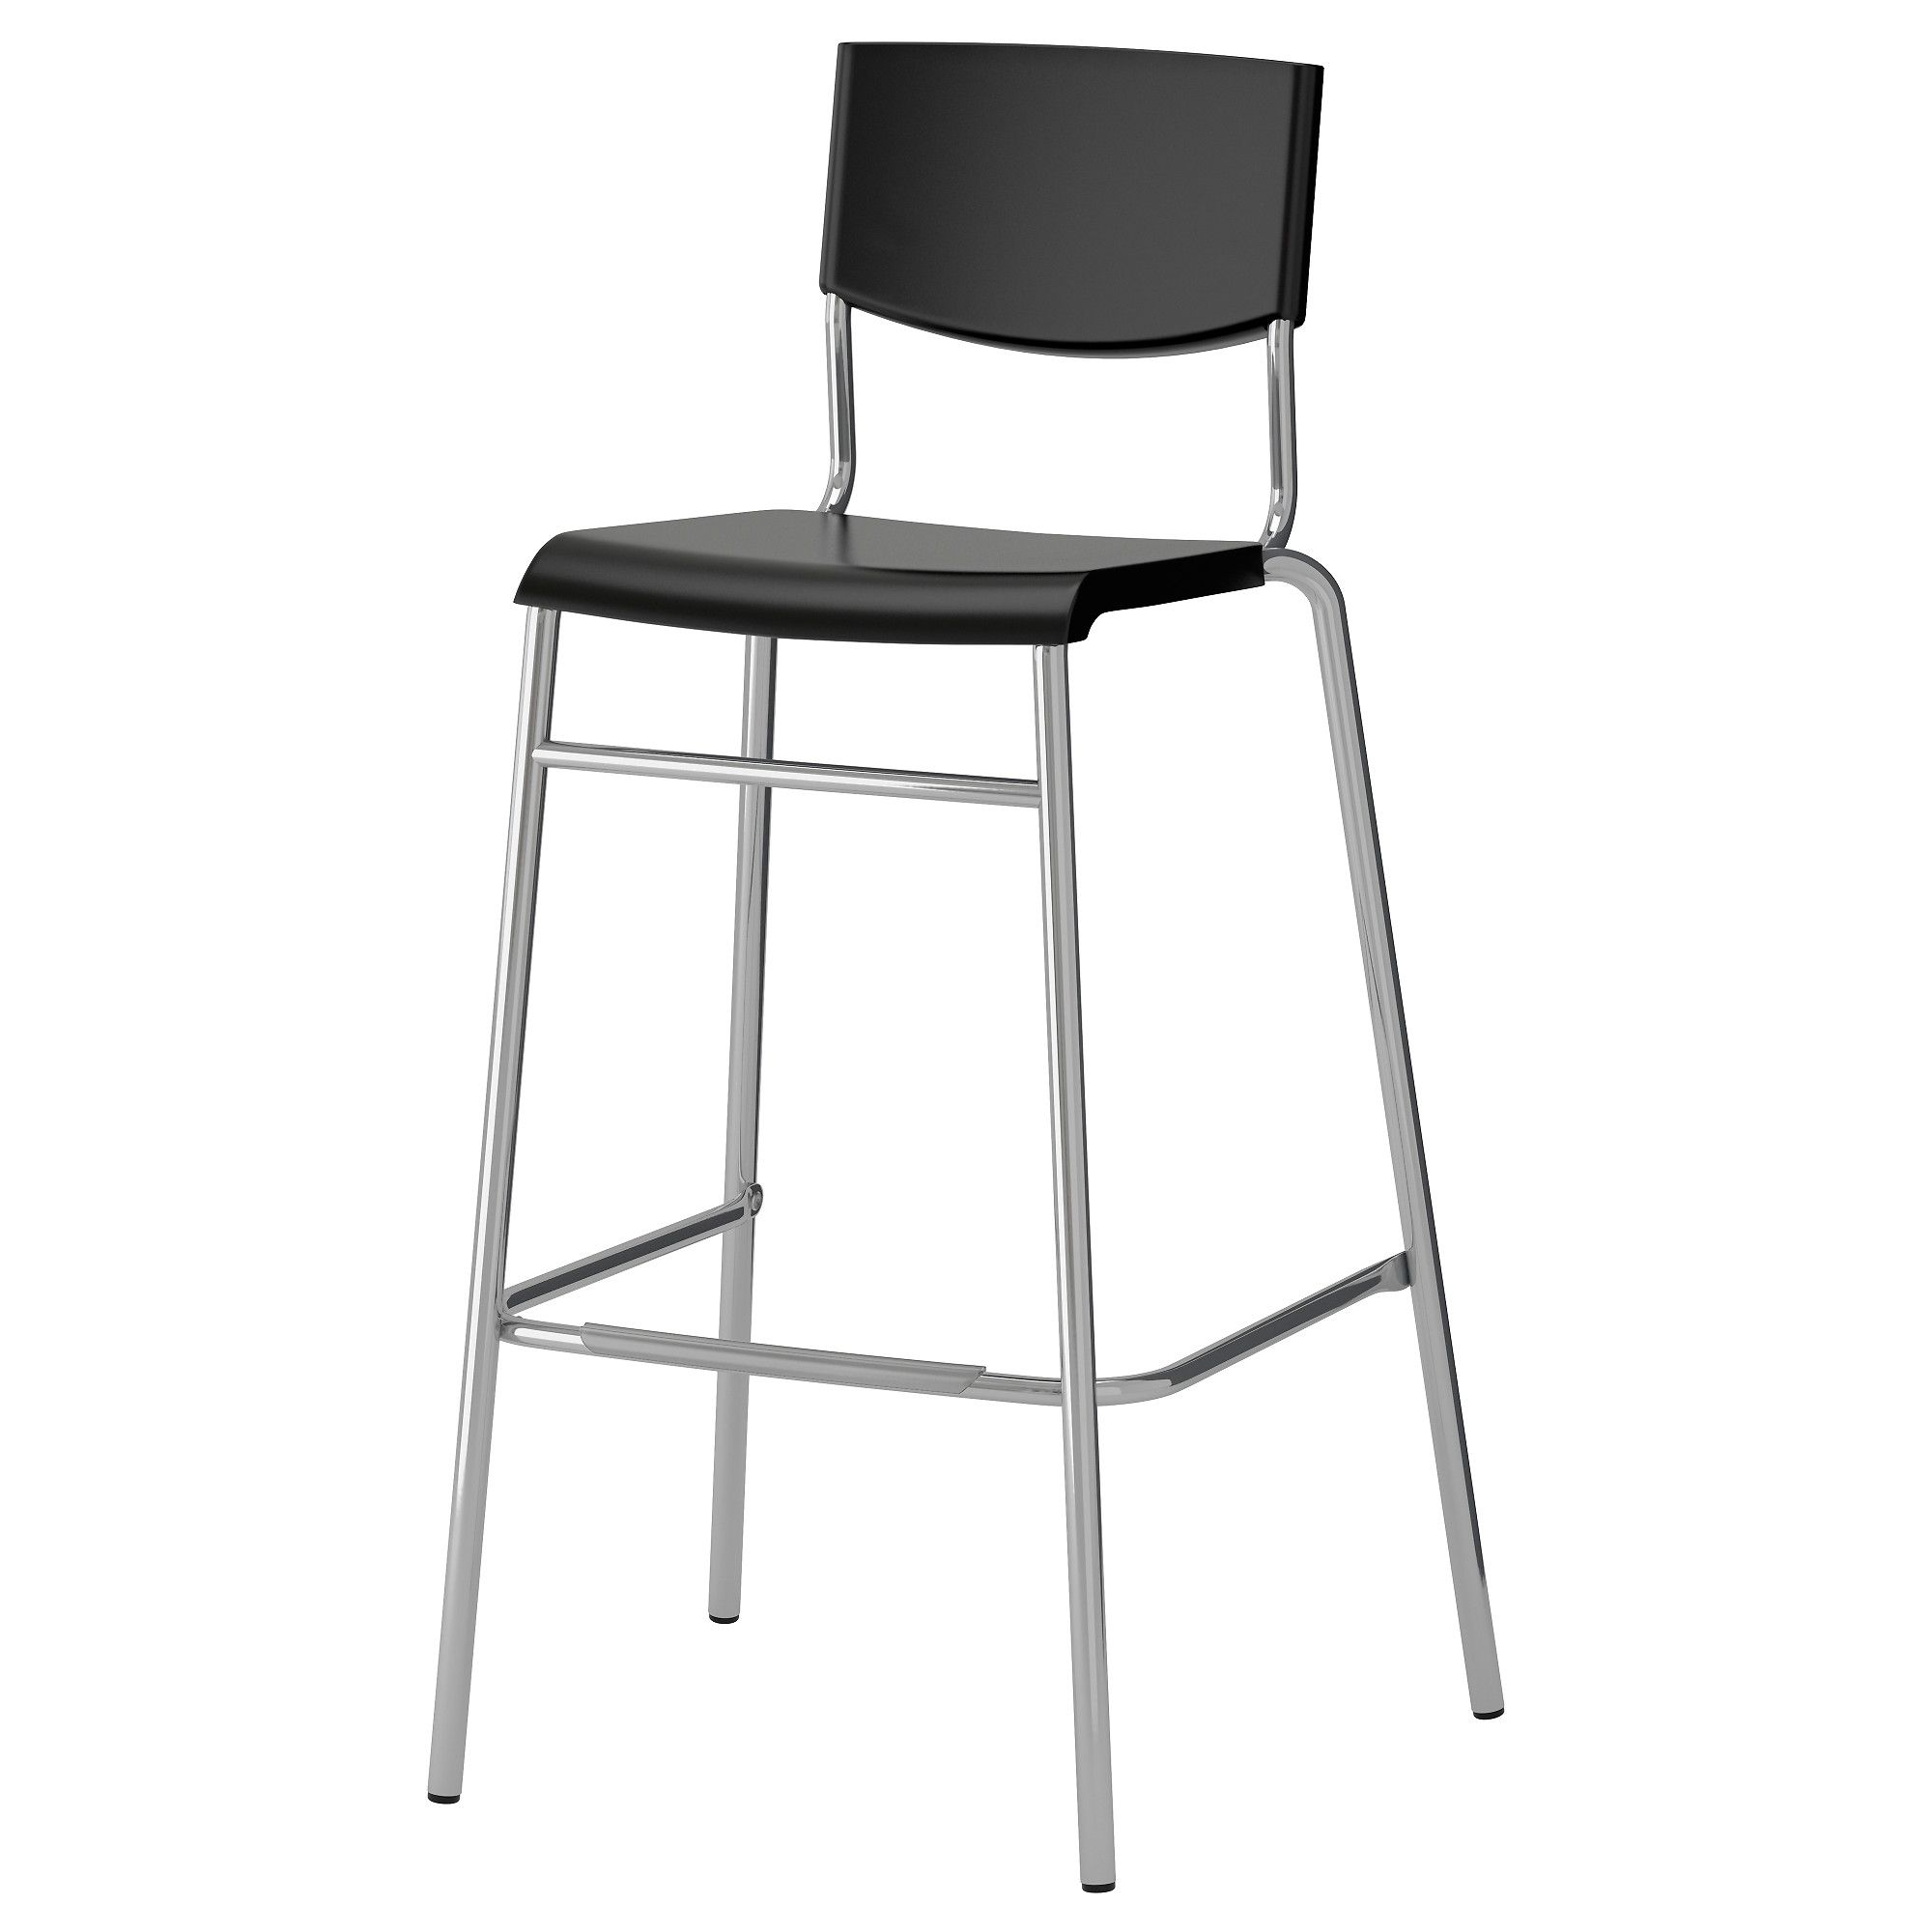 Ikea Stig Bar Stool With Backrest Black Silver Color Ikea Bar Ikea Barstools Bar Stools